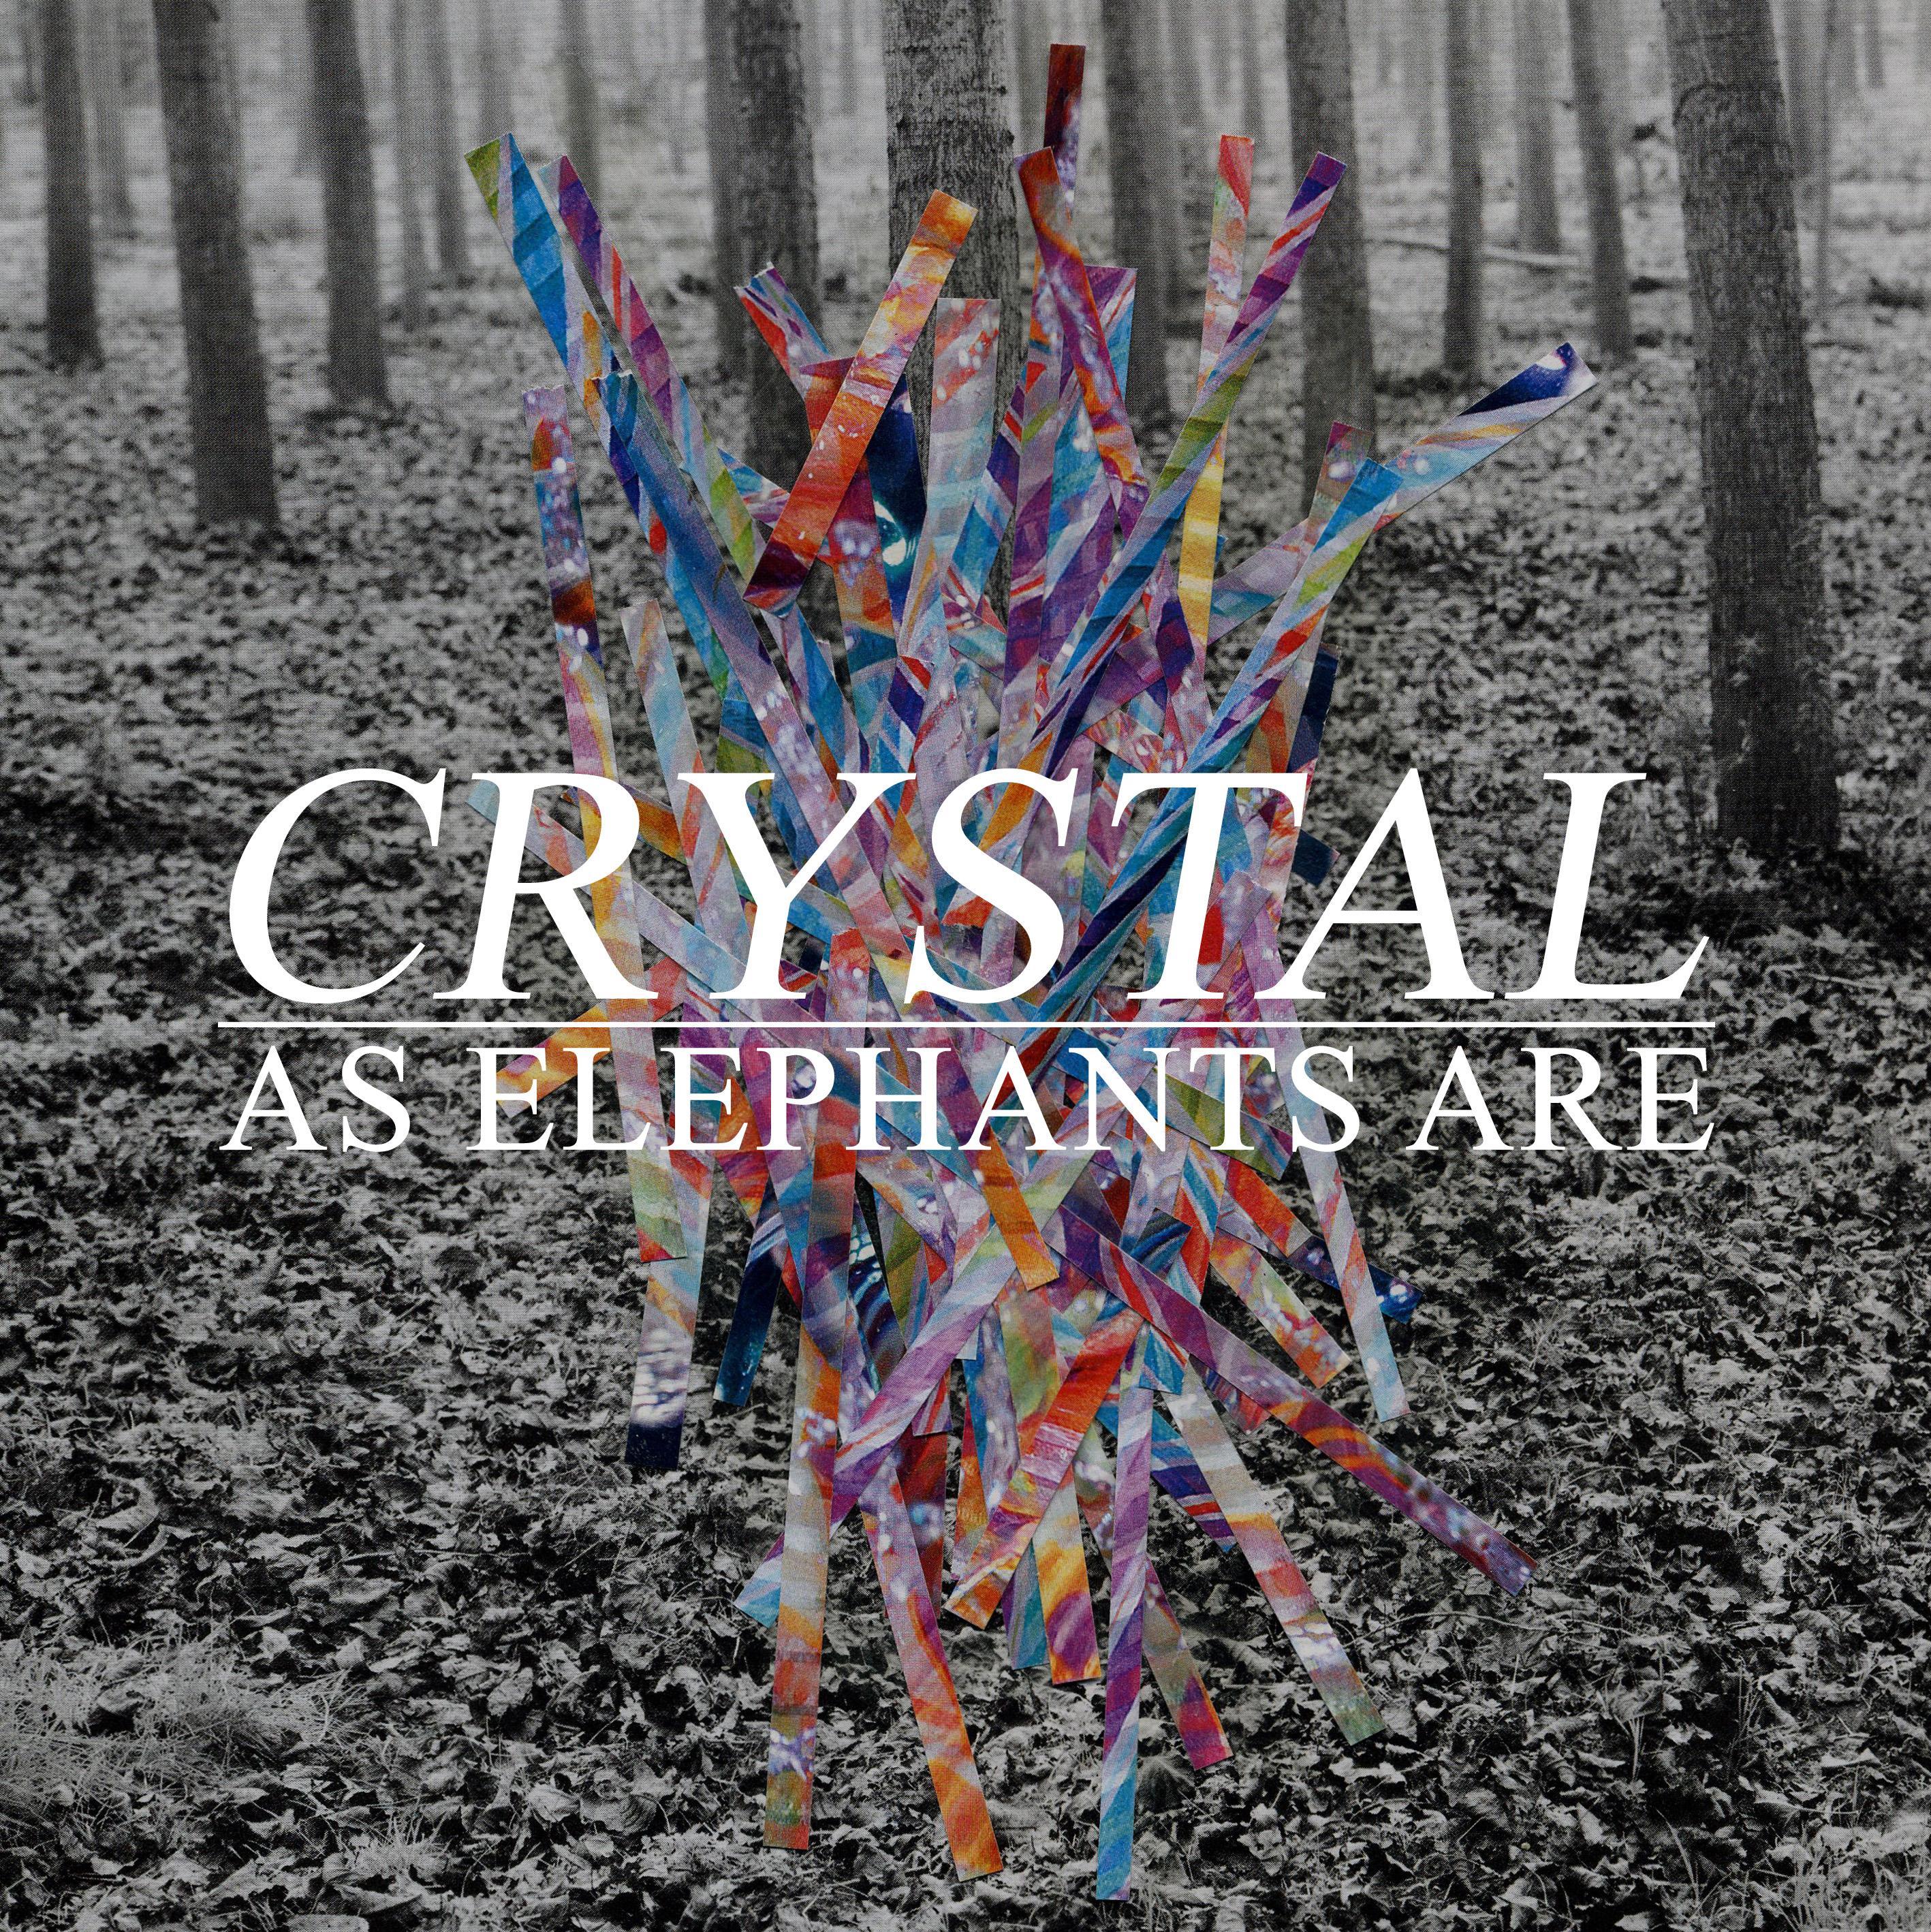 As Elephants Are Crystal